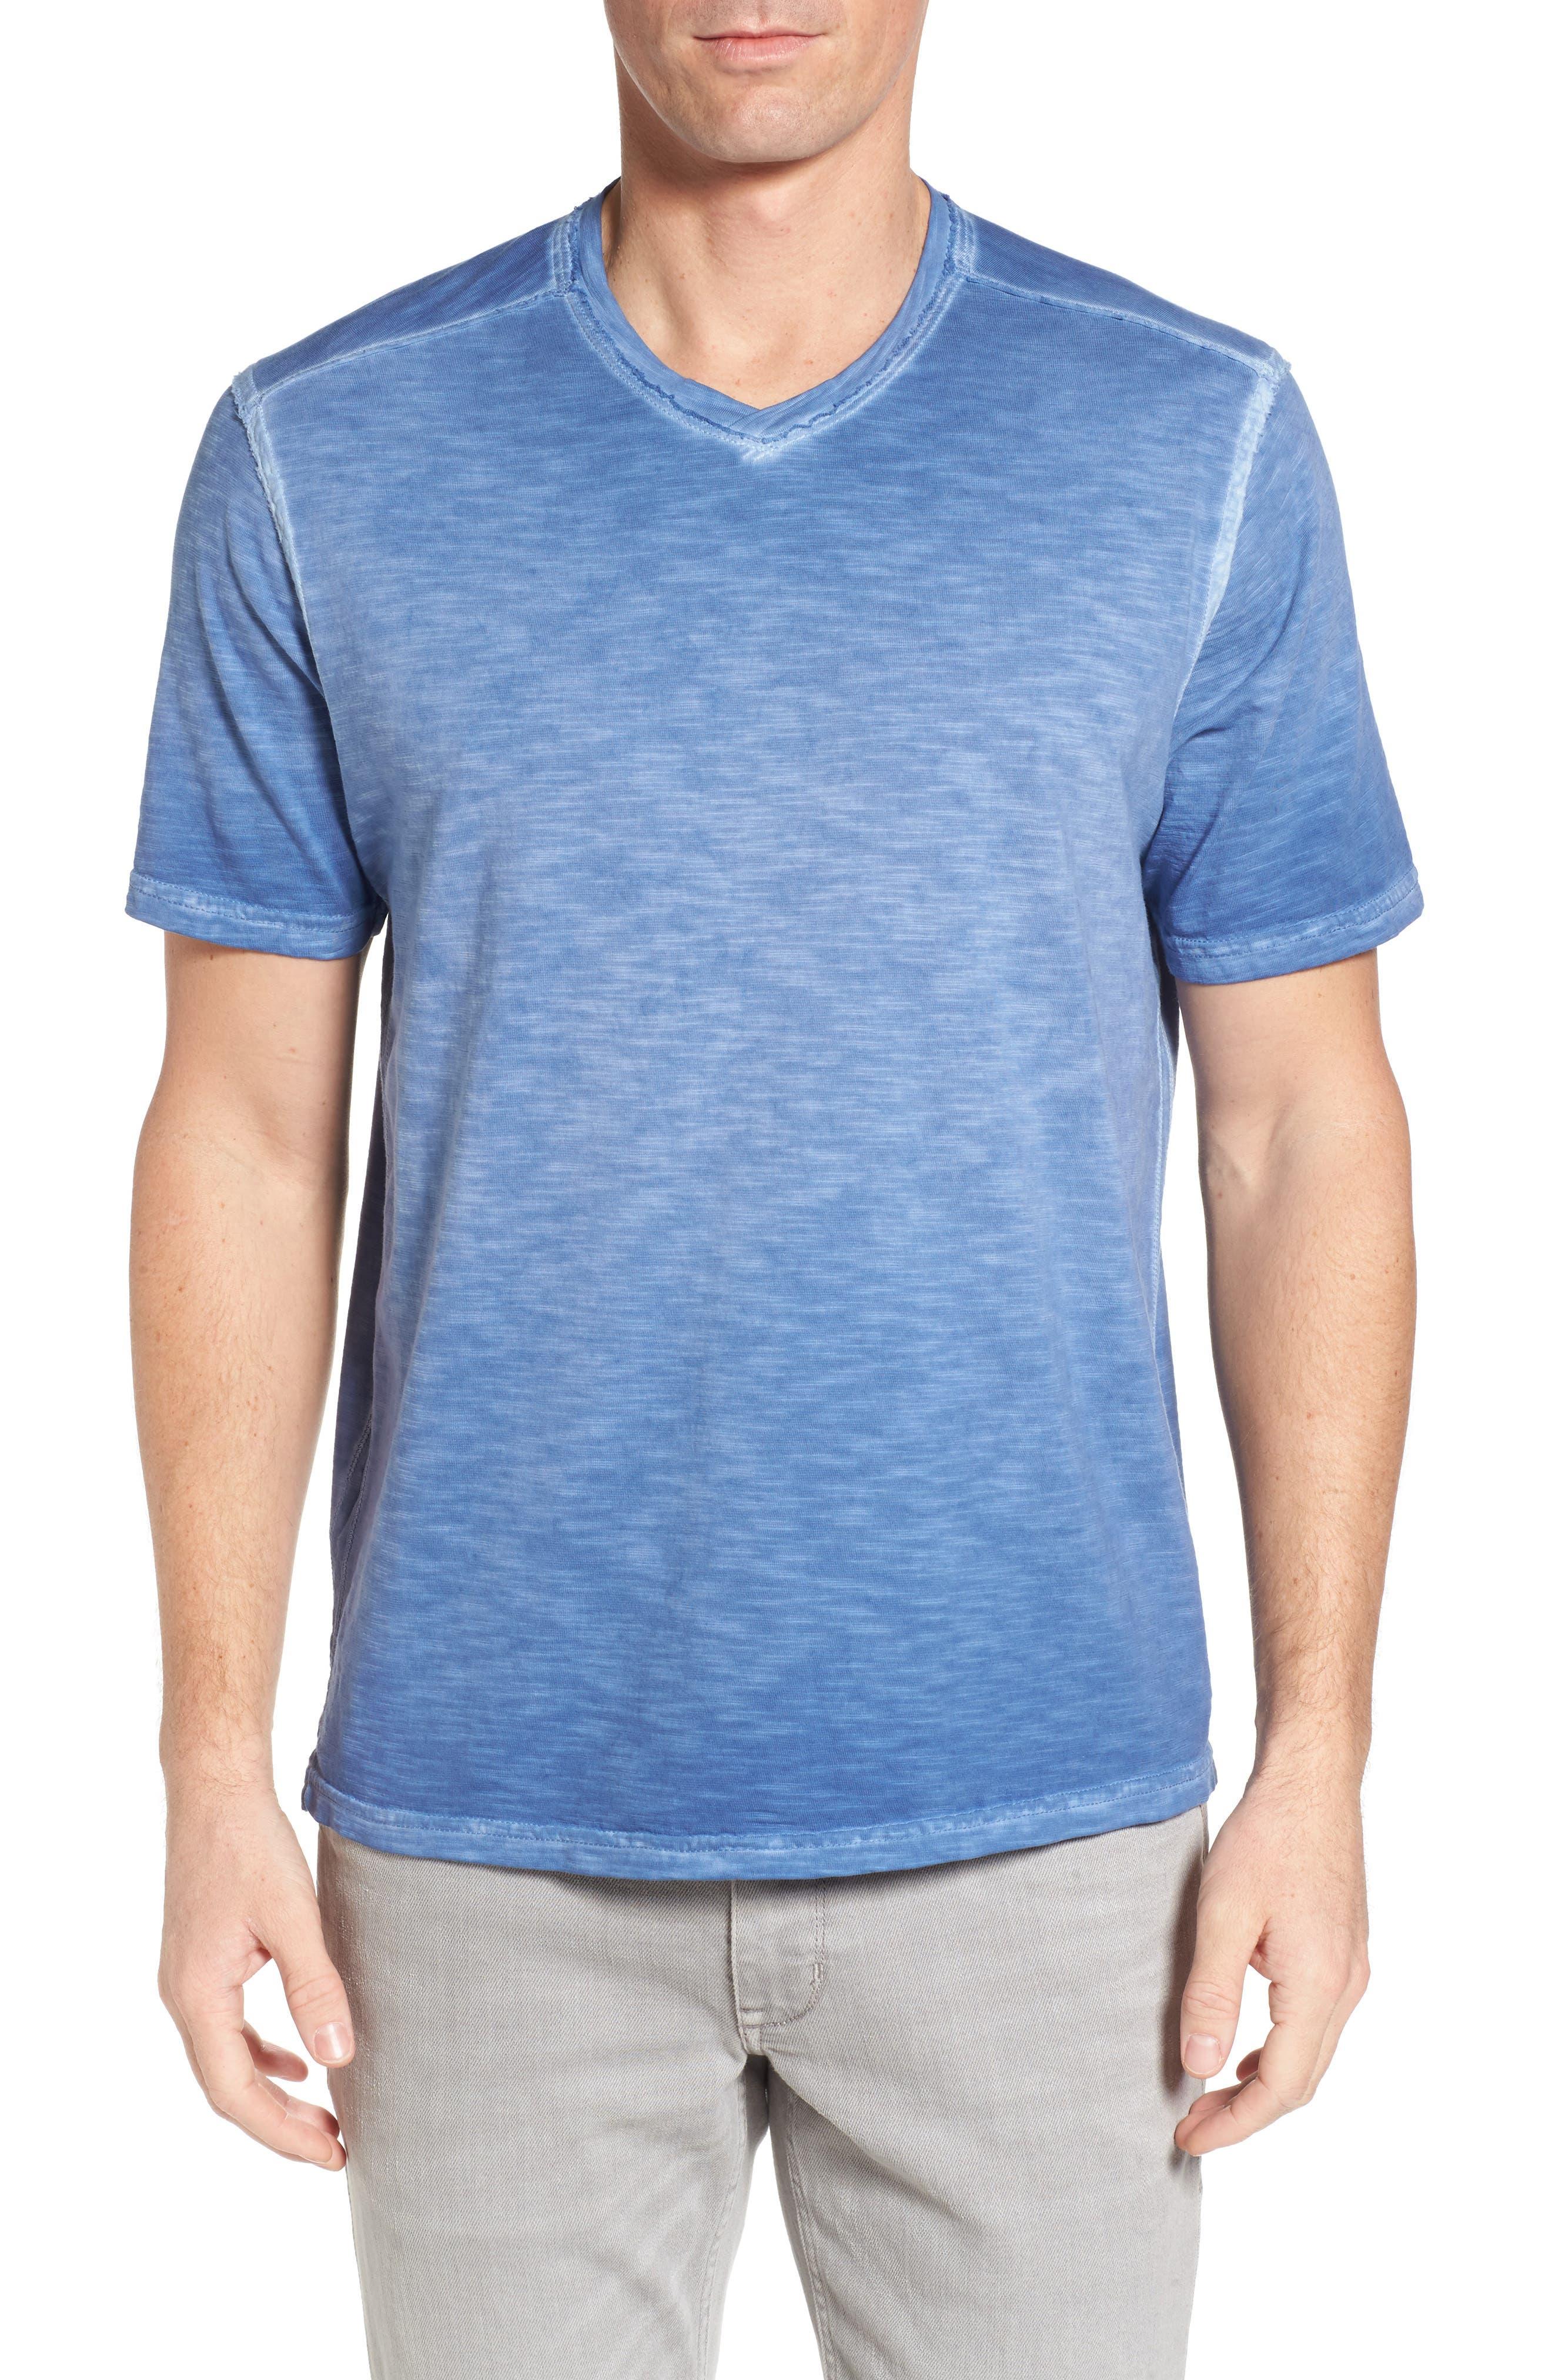 Suncoast Shores V-Neck T-Shirt,                         Main,                         color, Dockside Blue